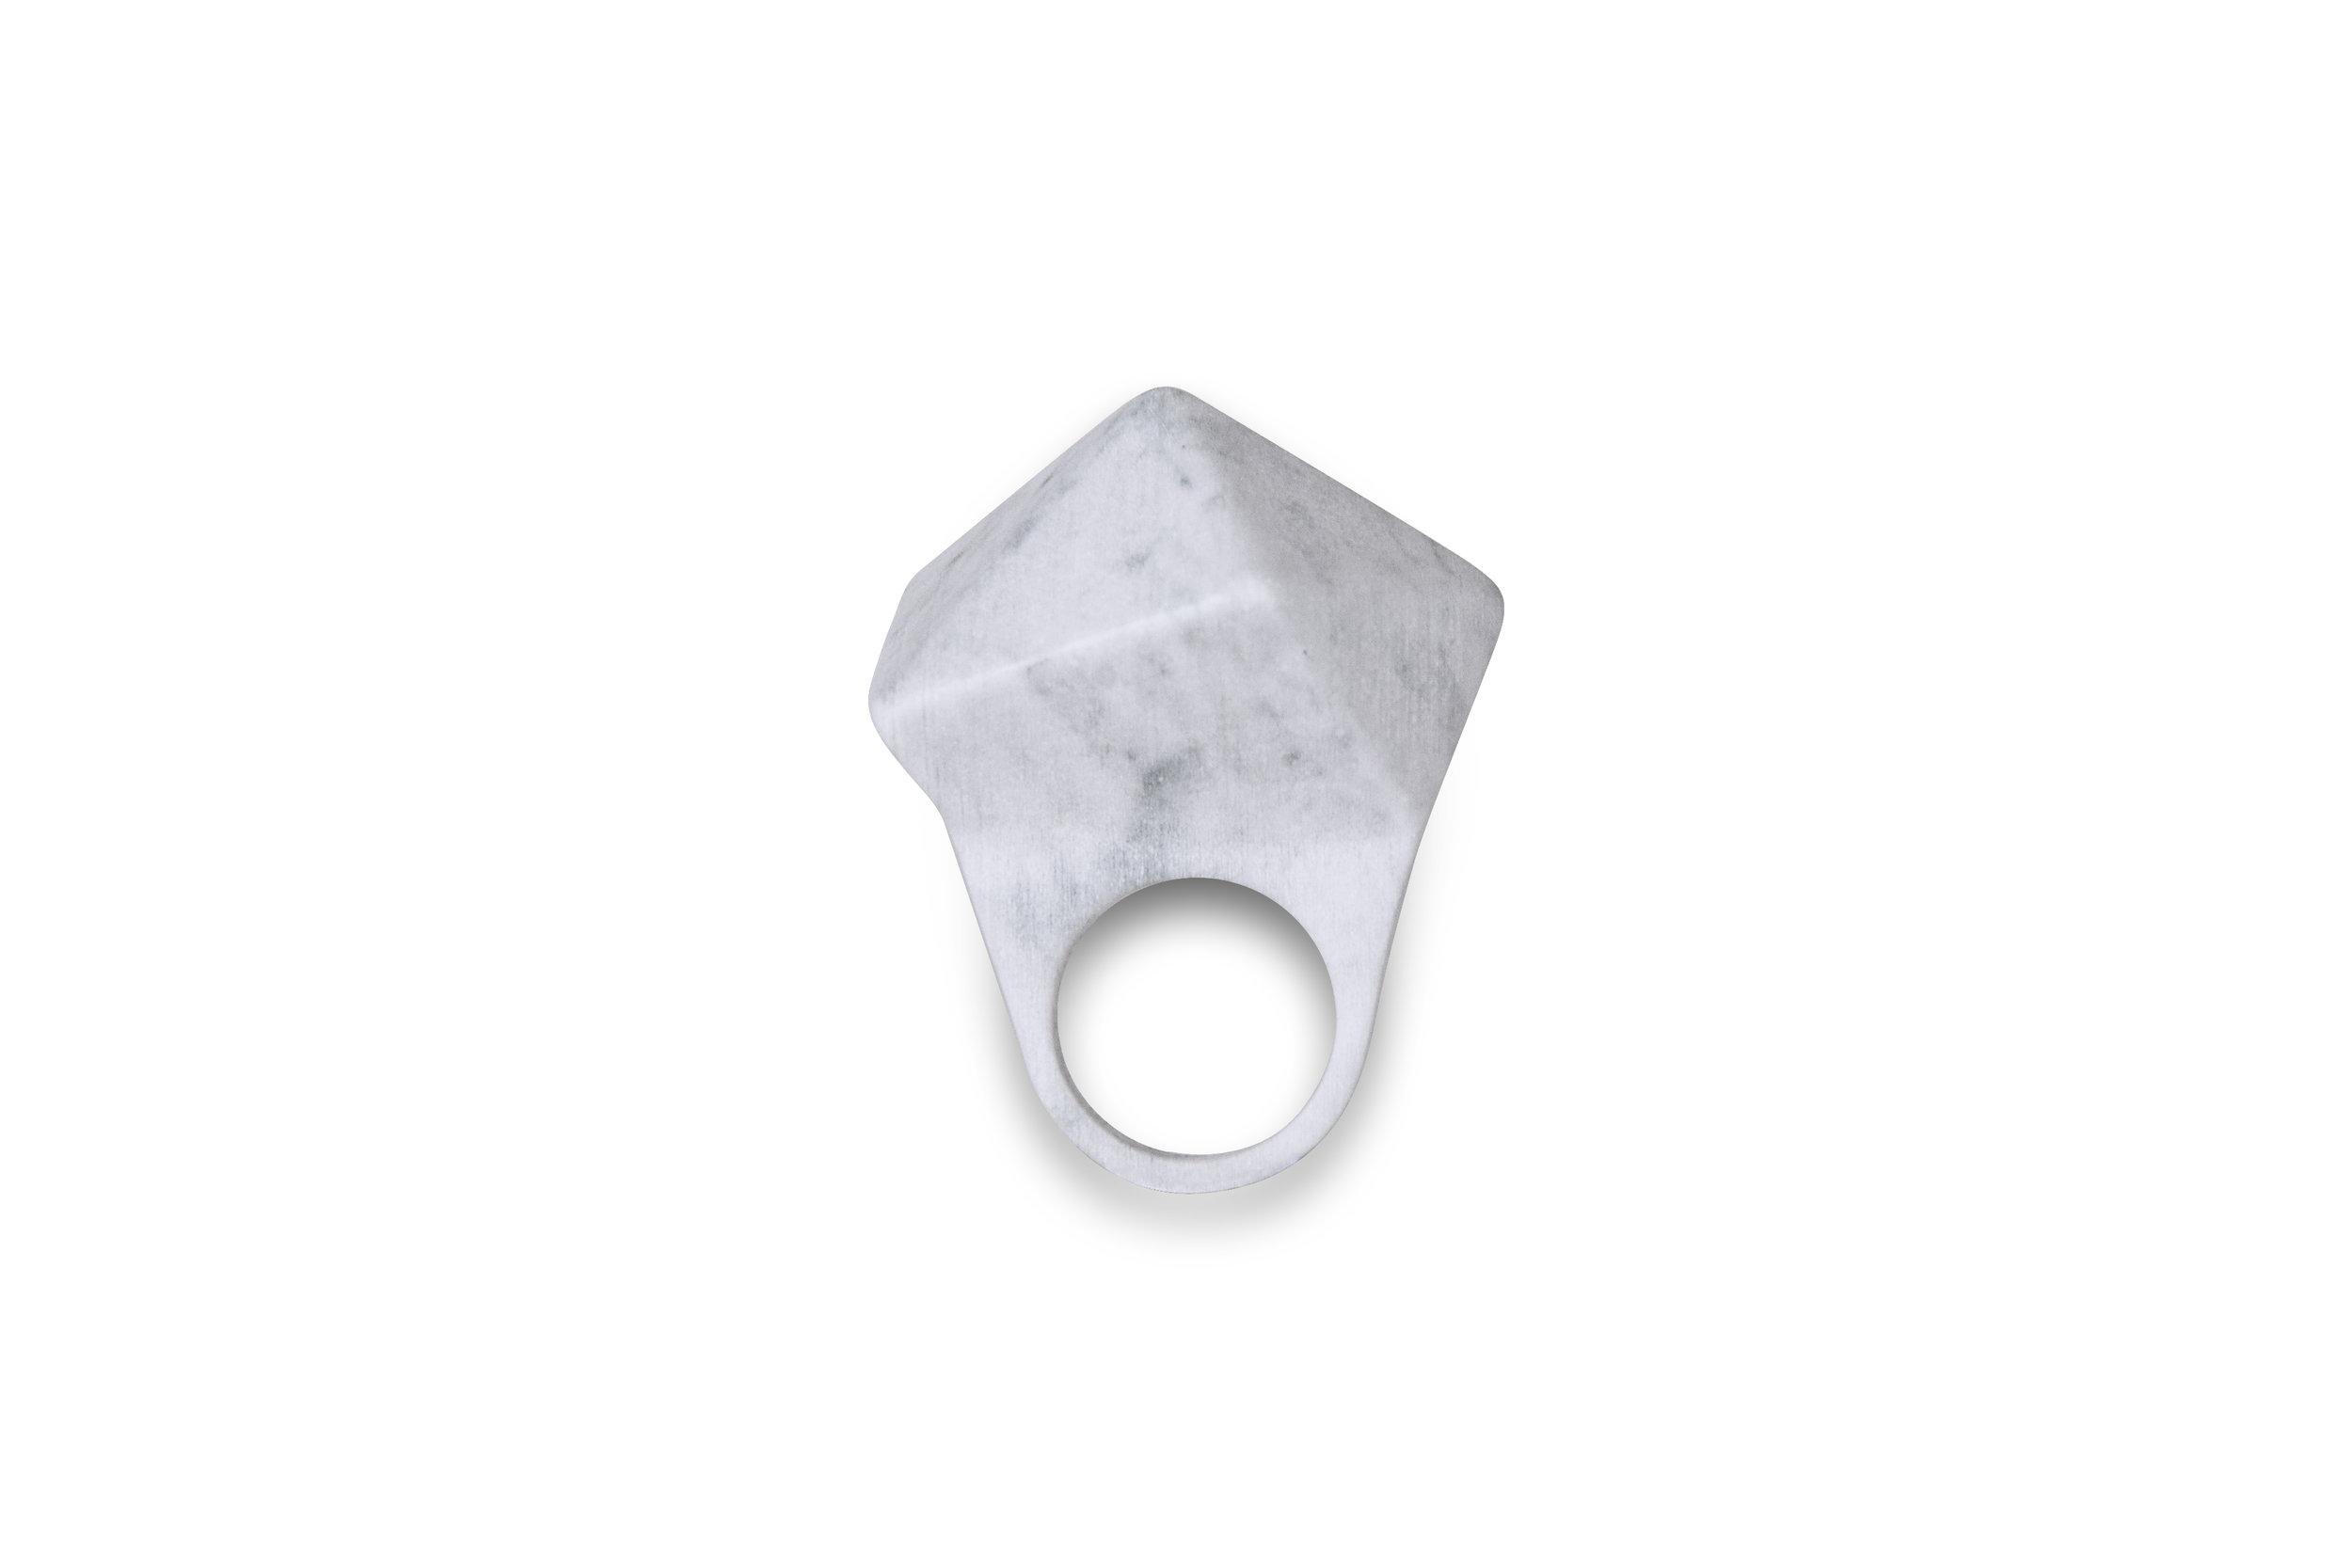 Chloe_Ring_Digital Marble_Carrara_Space Junk 2014.jpg